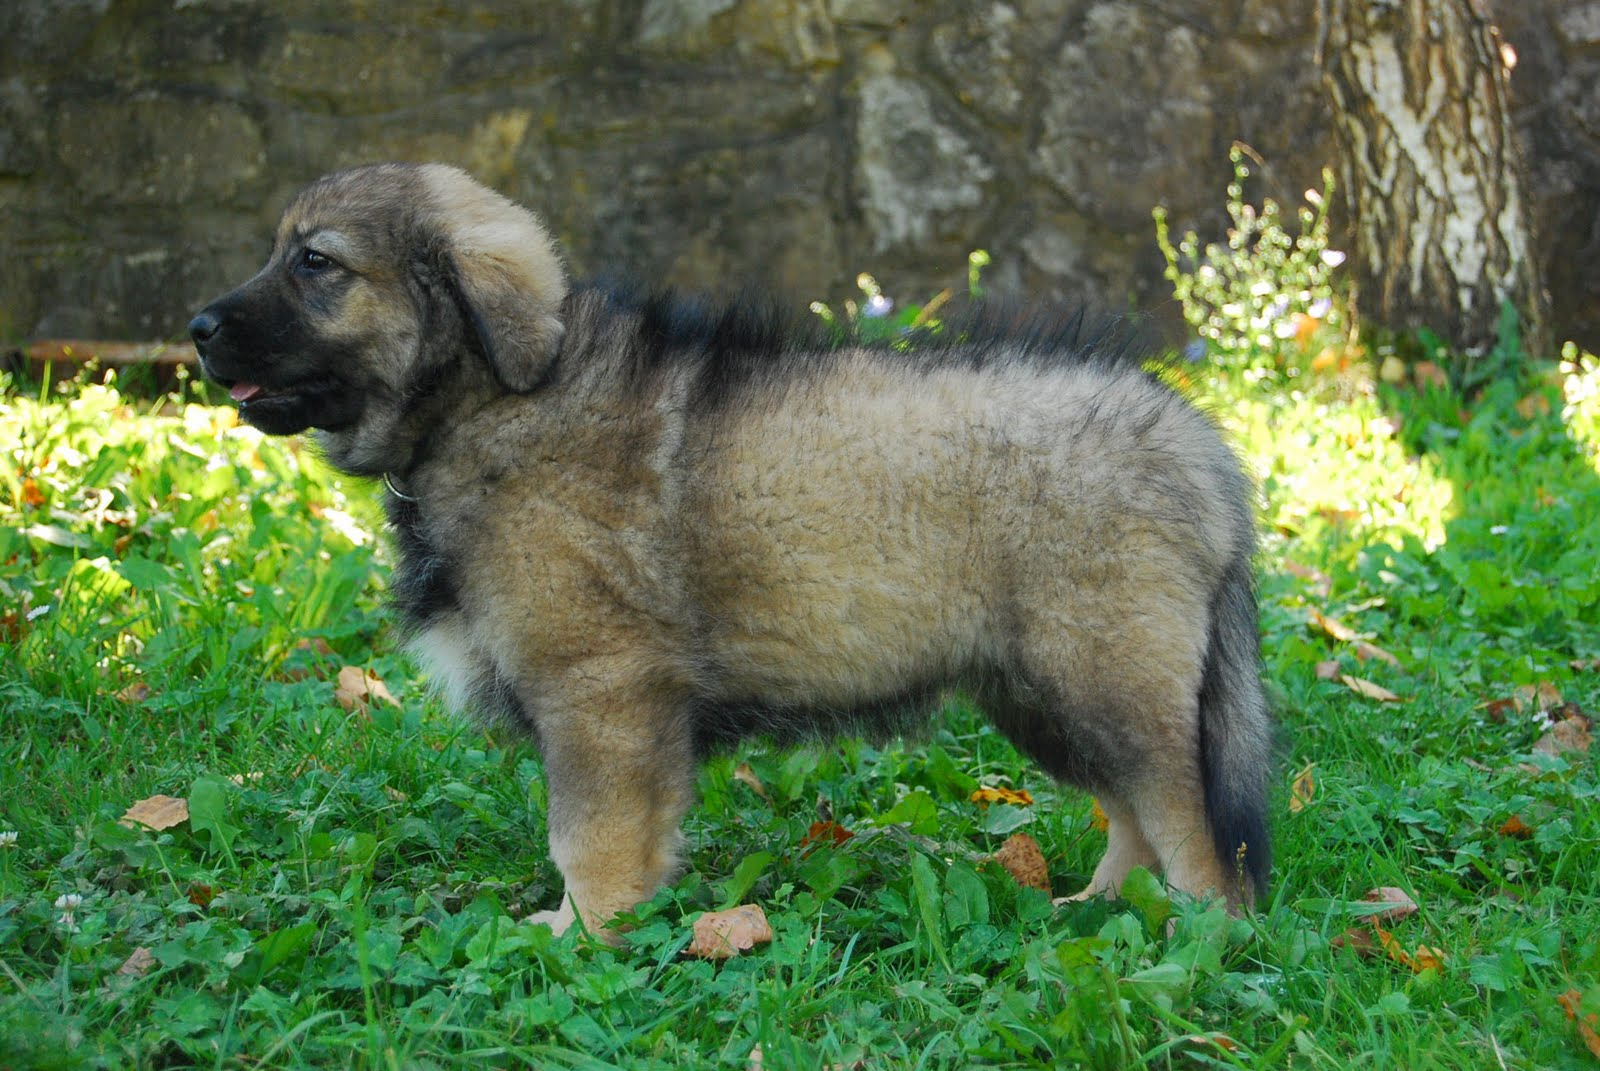 Karst Shepherd Dog: Karst Nice Karst Shepherd Dog Breed